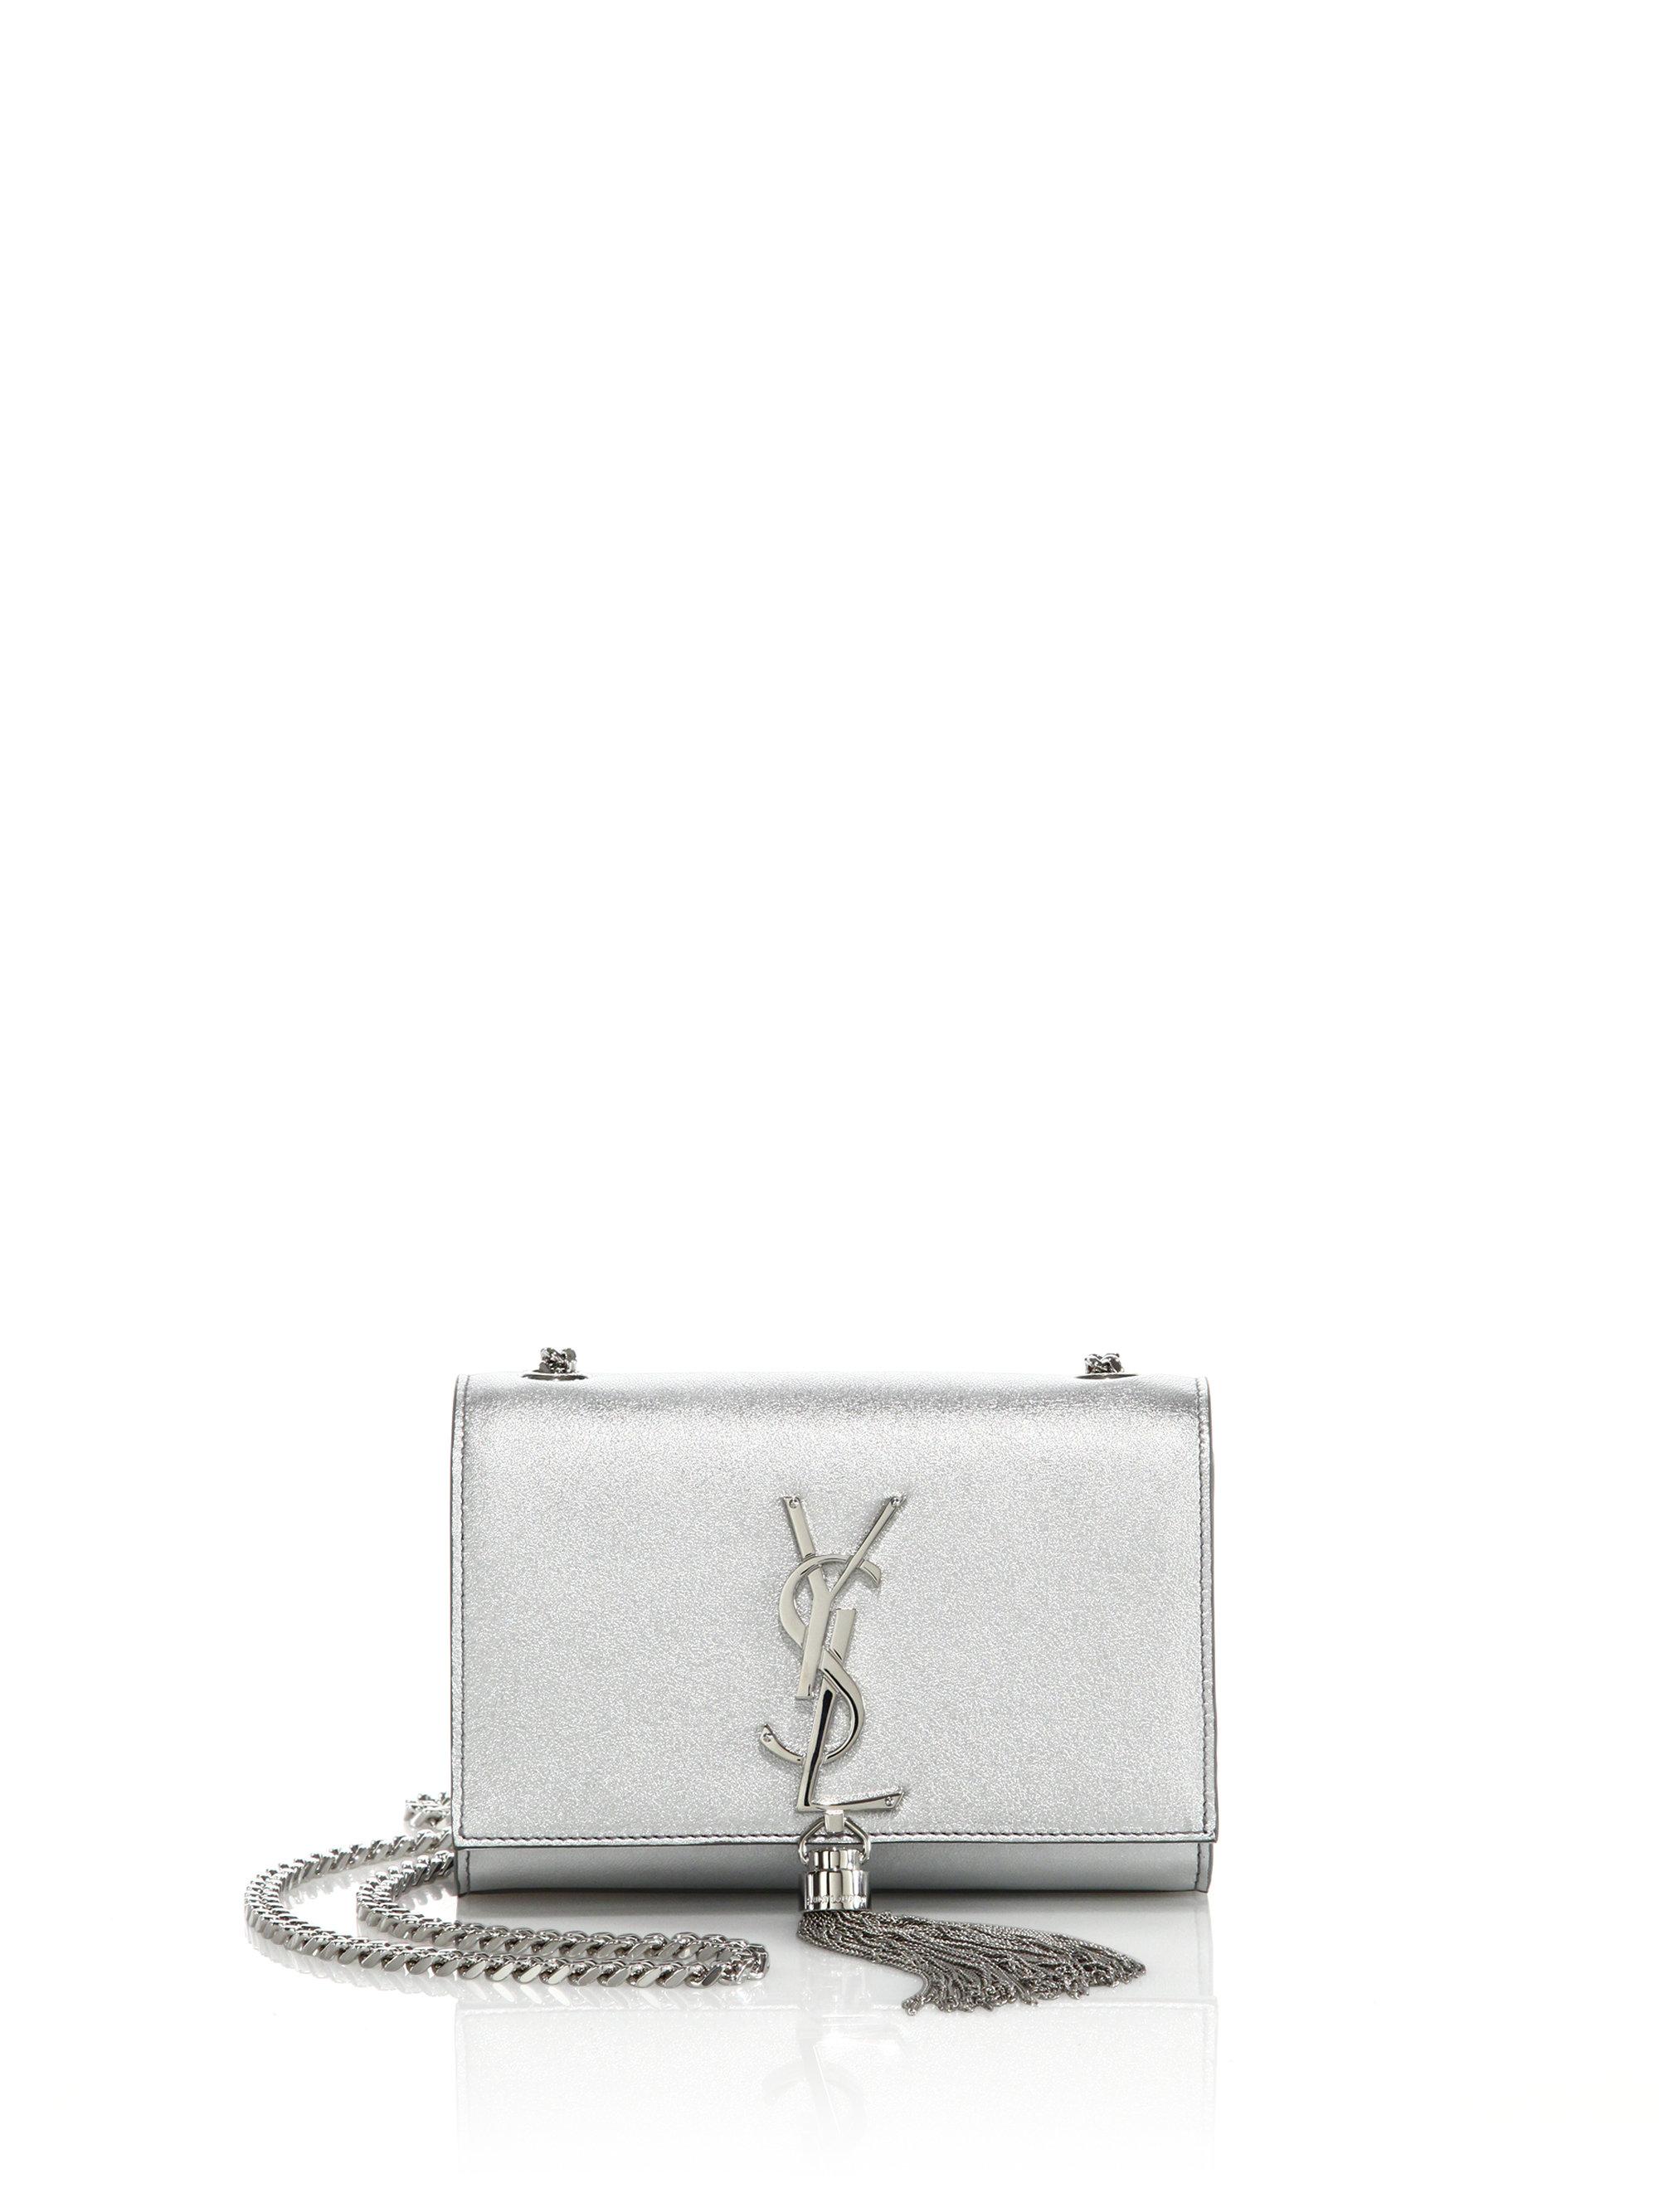 Classic Small Kate Monogram Saint Laurent Tassel Satchel In Silver Metallic Leather